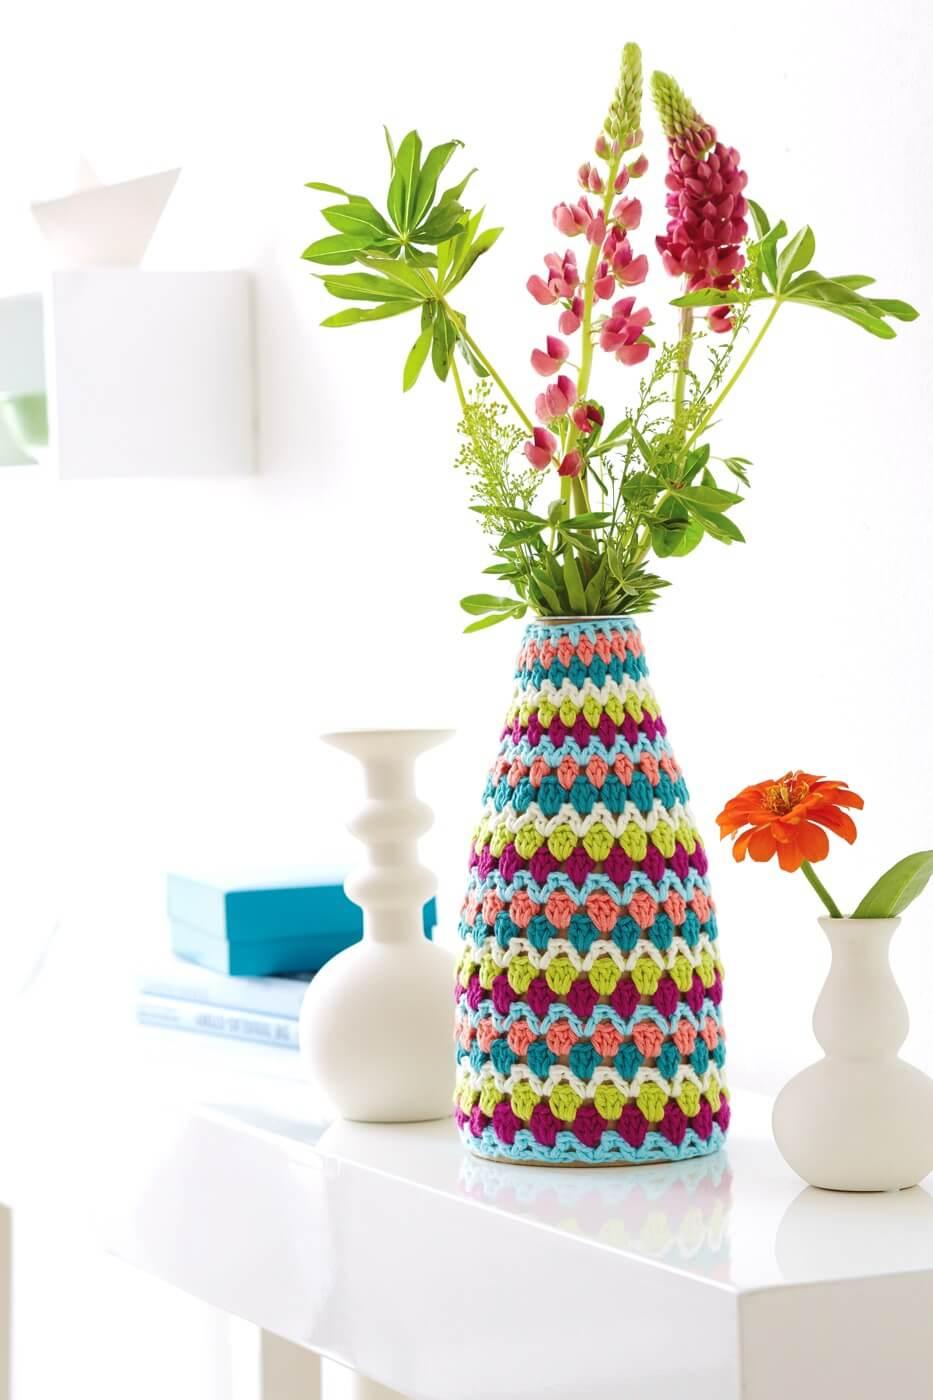 Gehäkelter Vasenbezug